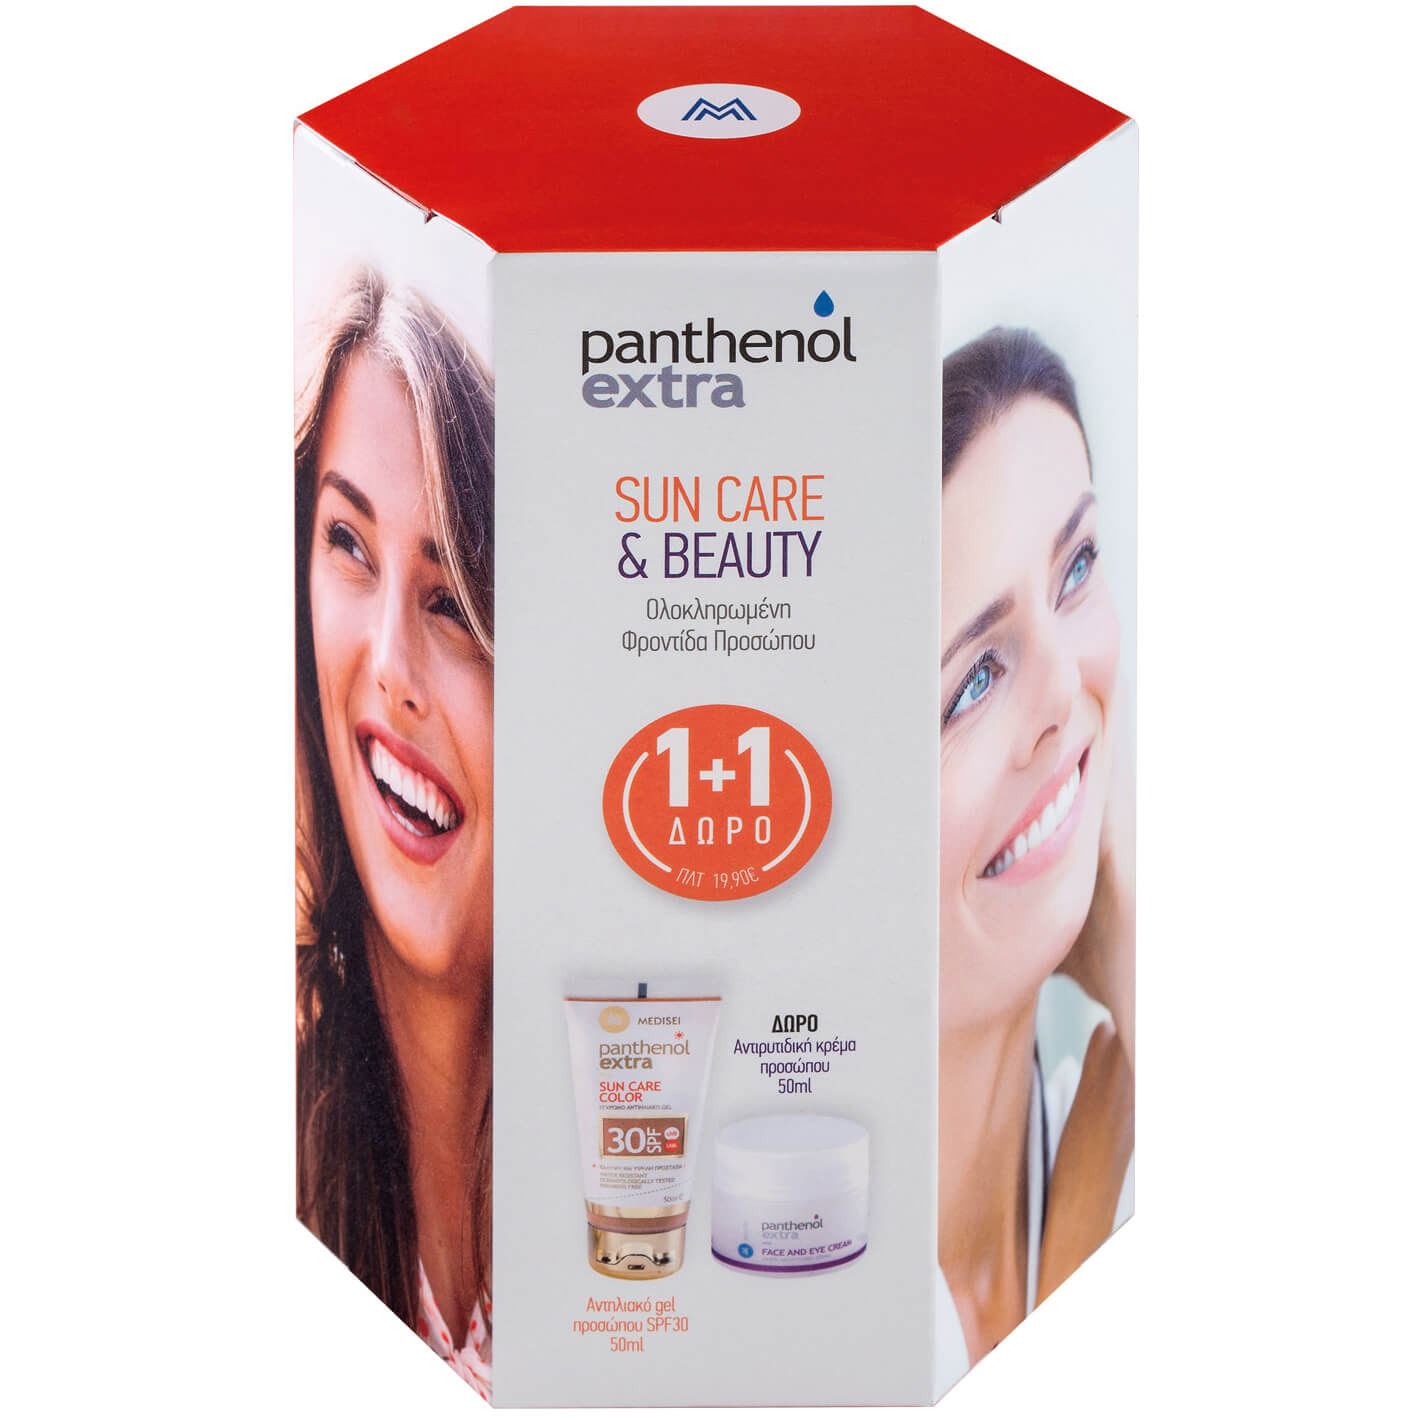 Panthenol Extra Πακέτο Προσφοράς Sun Care Color Spf30Αντηλιακή Προστασία με Χρώμα 50ml& Δώρο 24ωρη Αντιρυτιδική Κρέμα 50ml